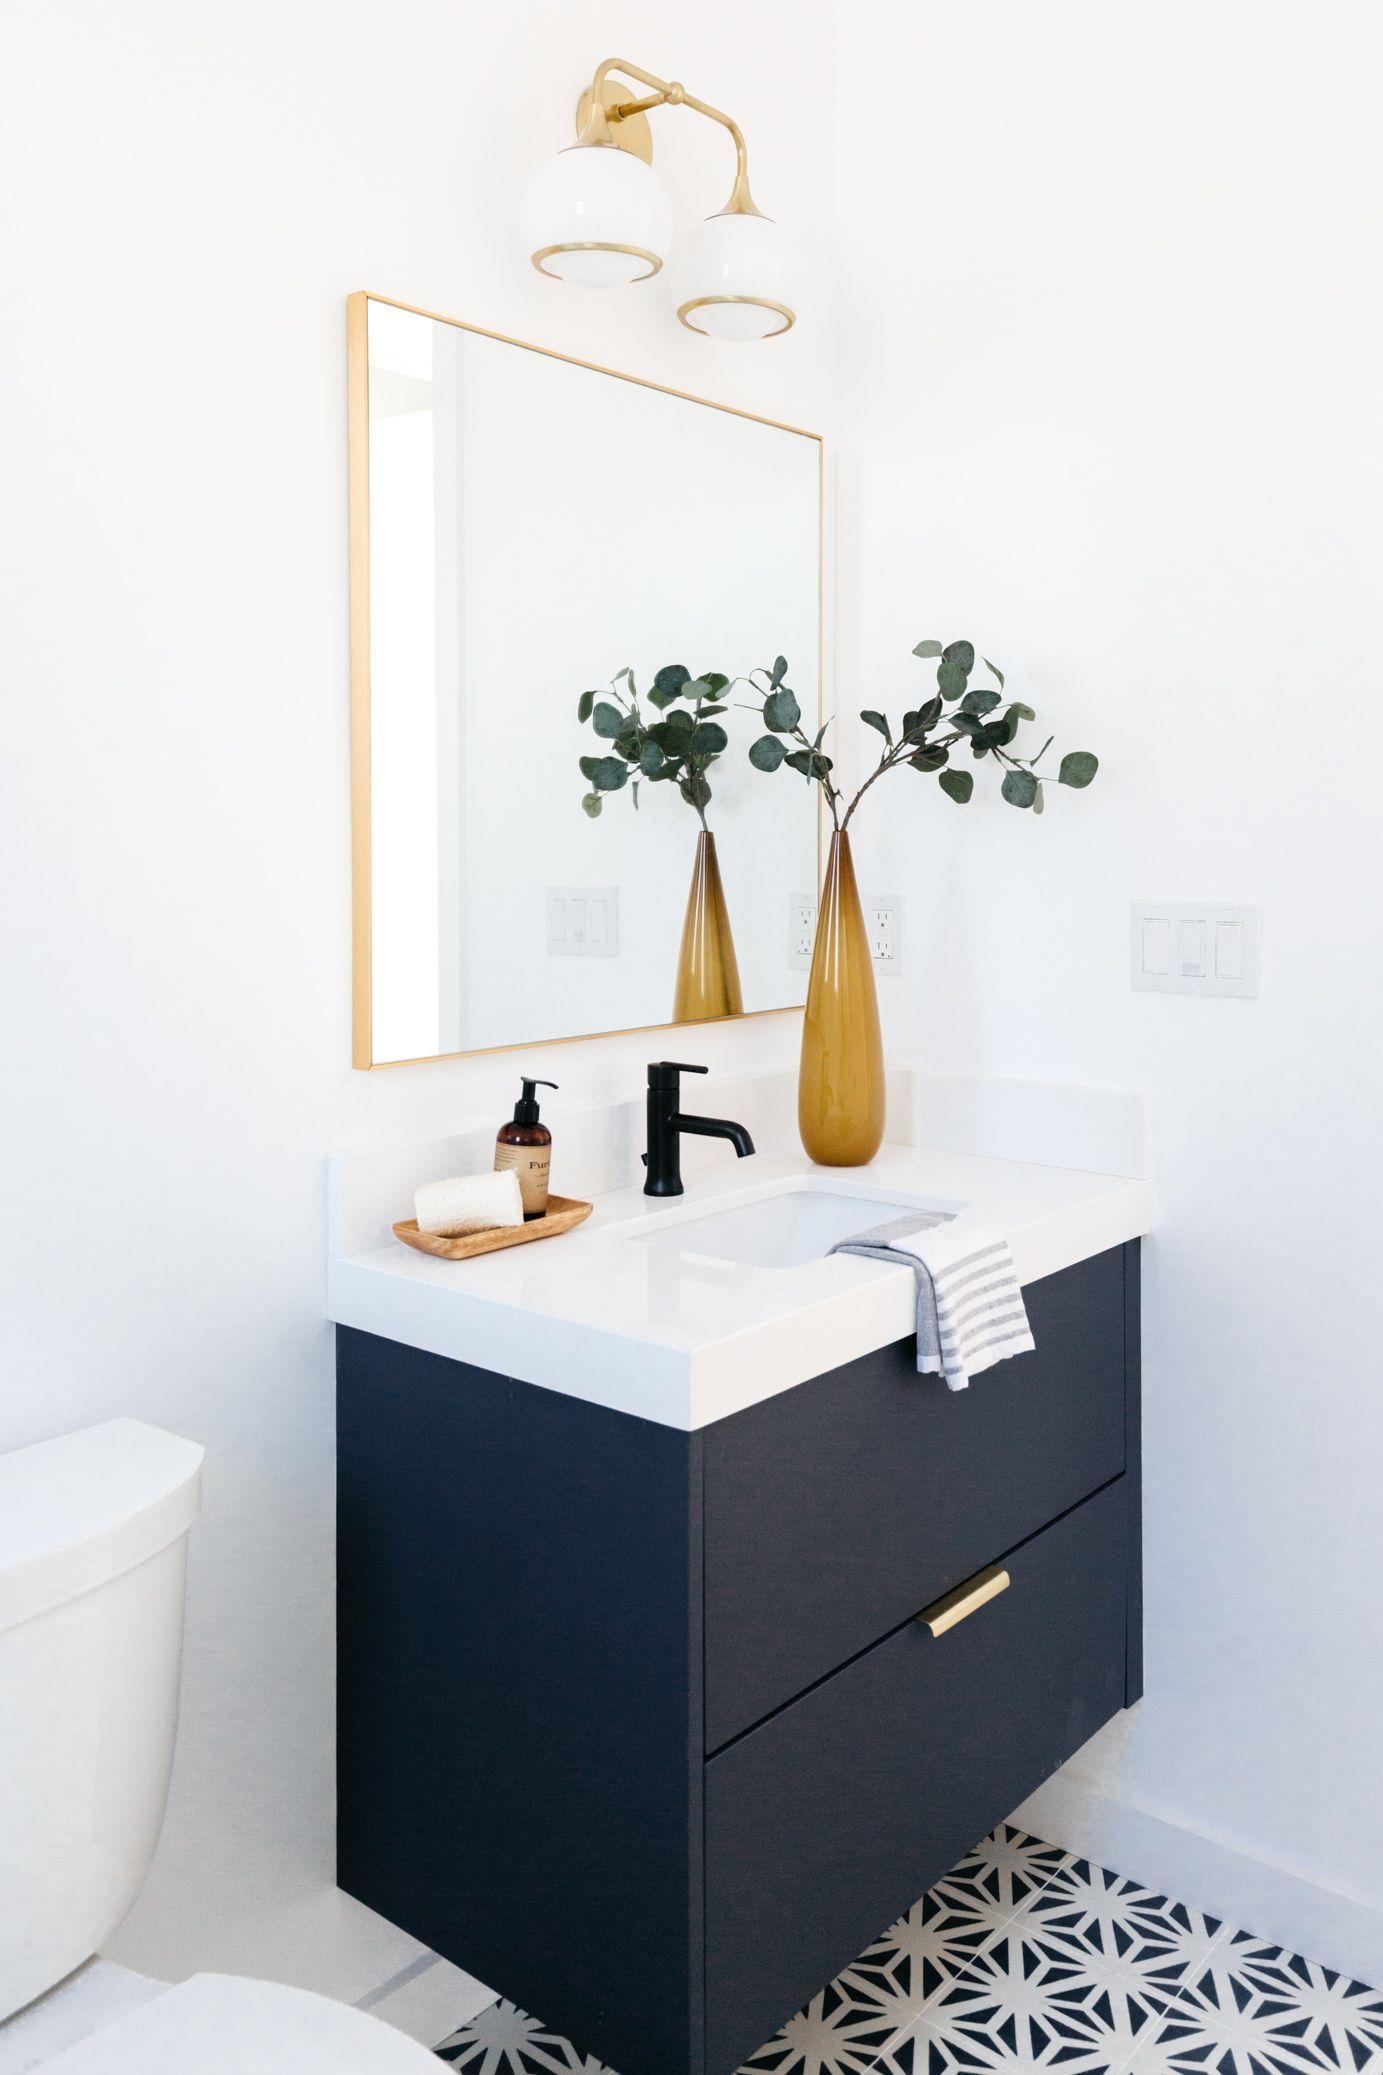 Semihandmade cabinet fronts in the bathroom in 2020 | Ikea ...